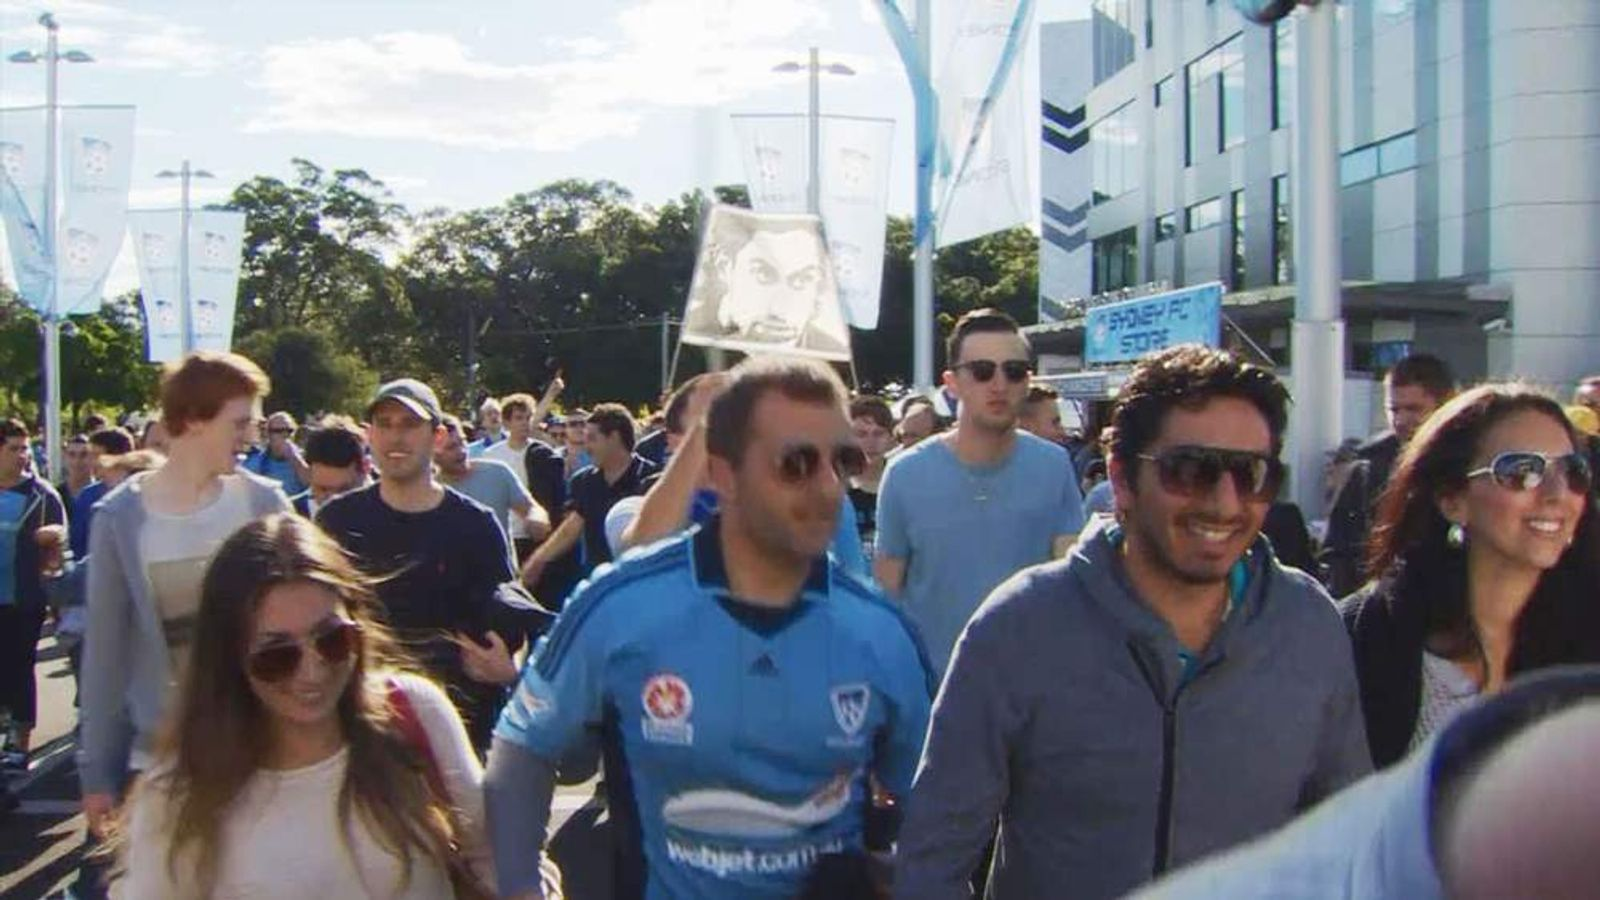 Australian football fans